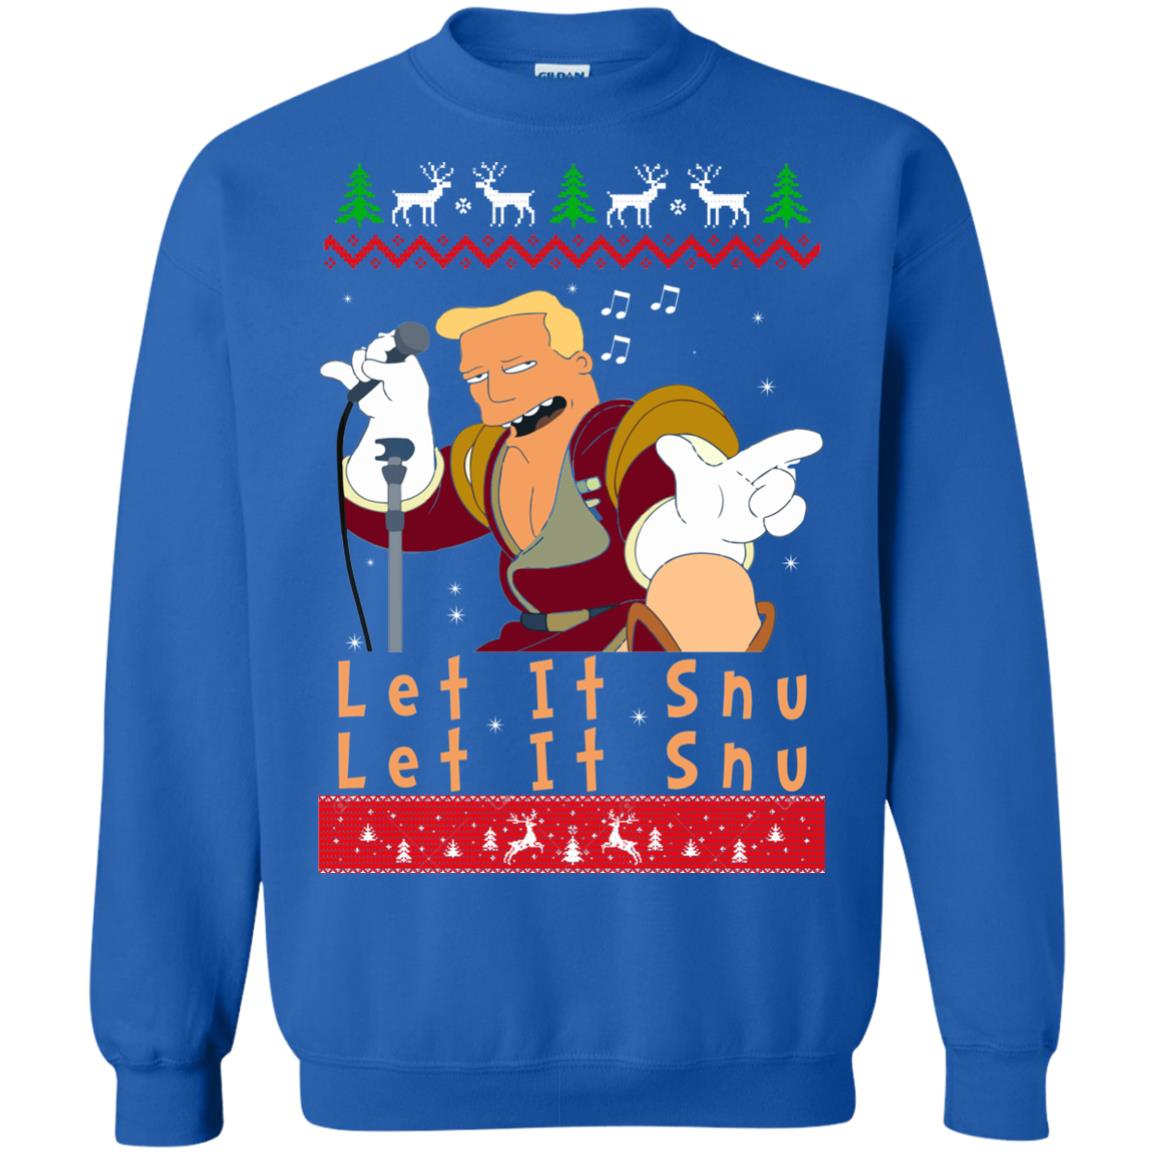 image 722 - Zapp Brannigan Let It Snu Christmas Sweatshirt, Hoodie